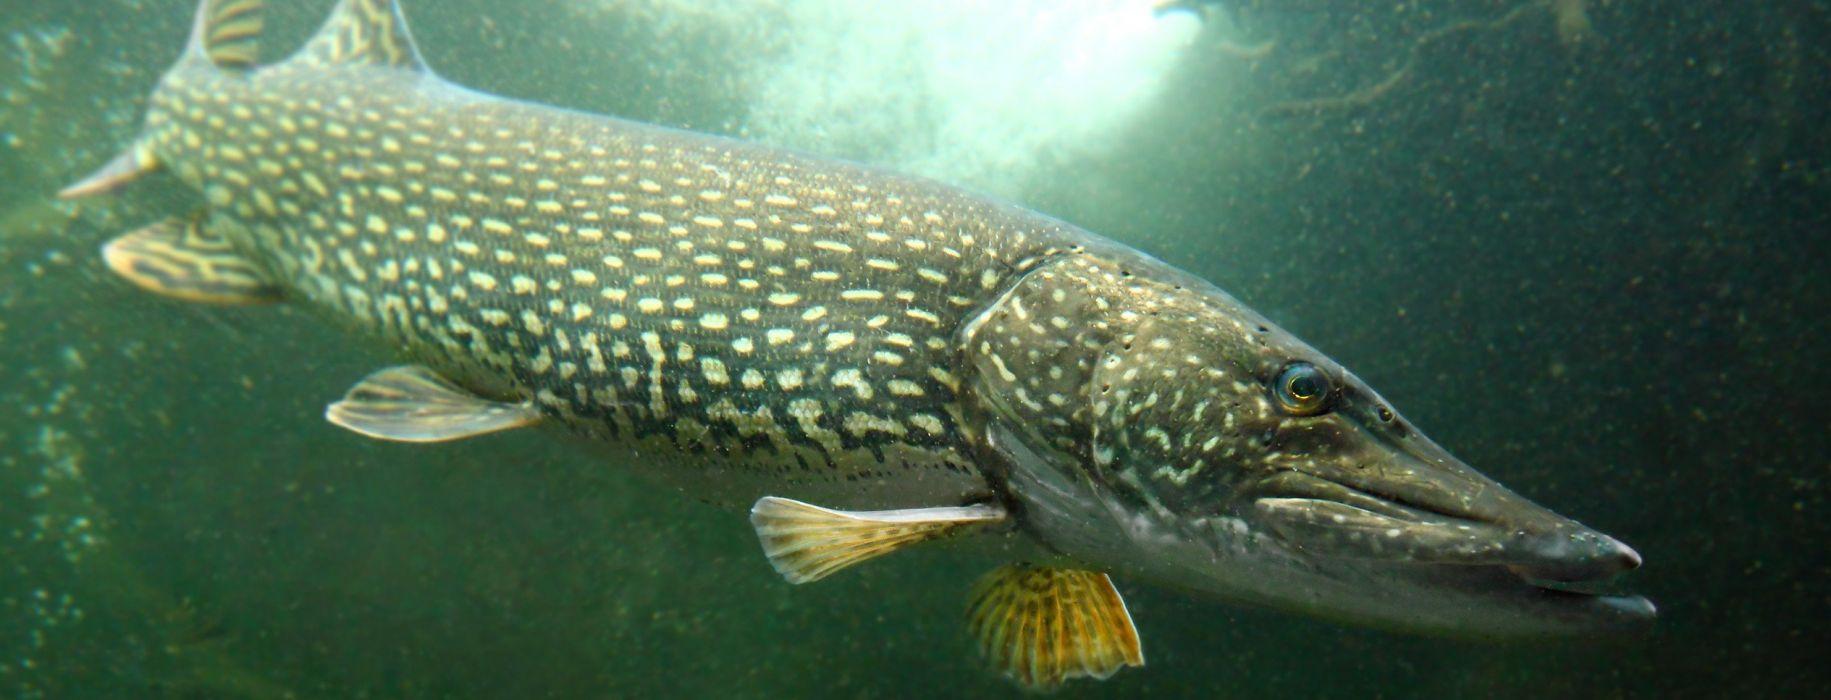 FISHING fish sport water fishes pike underwater wallpaper